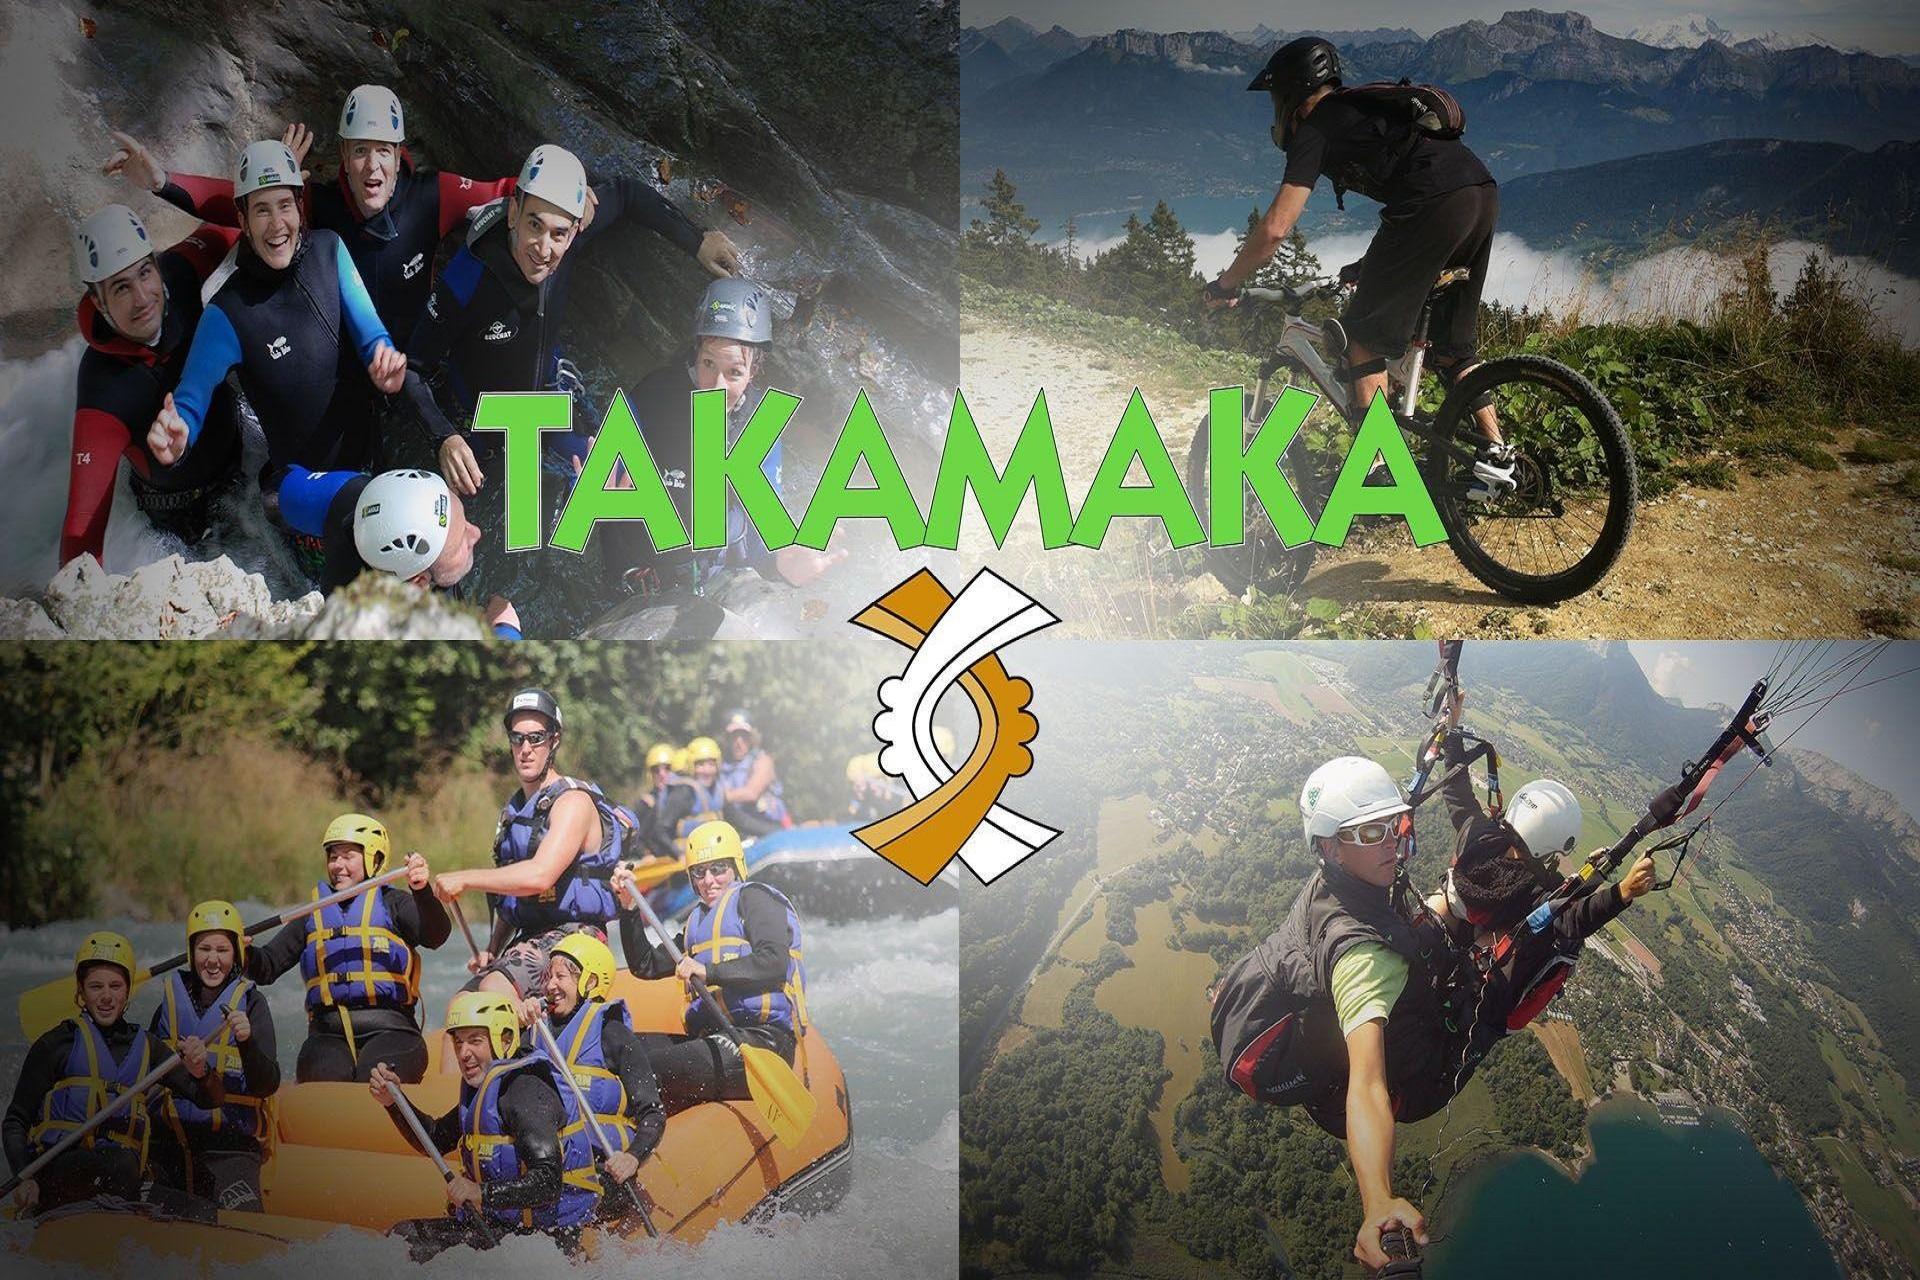 le-pelican-annecy-lyon-lac-montagne-takamaka-seminaires-de-caractere